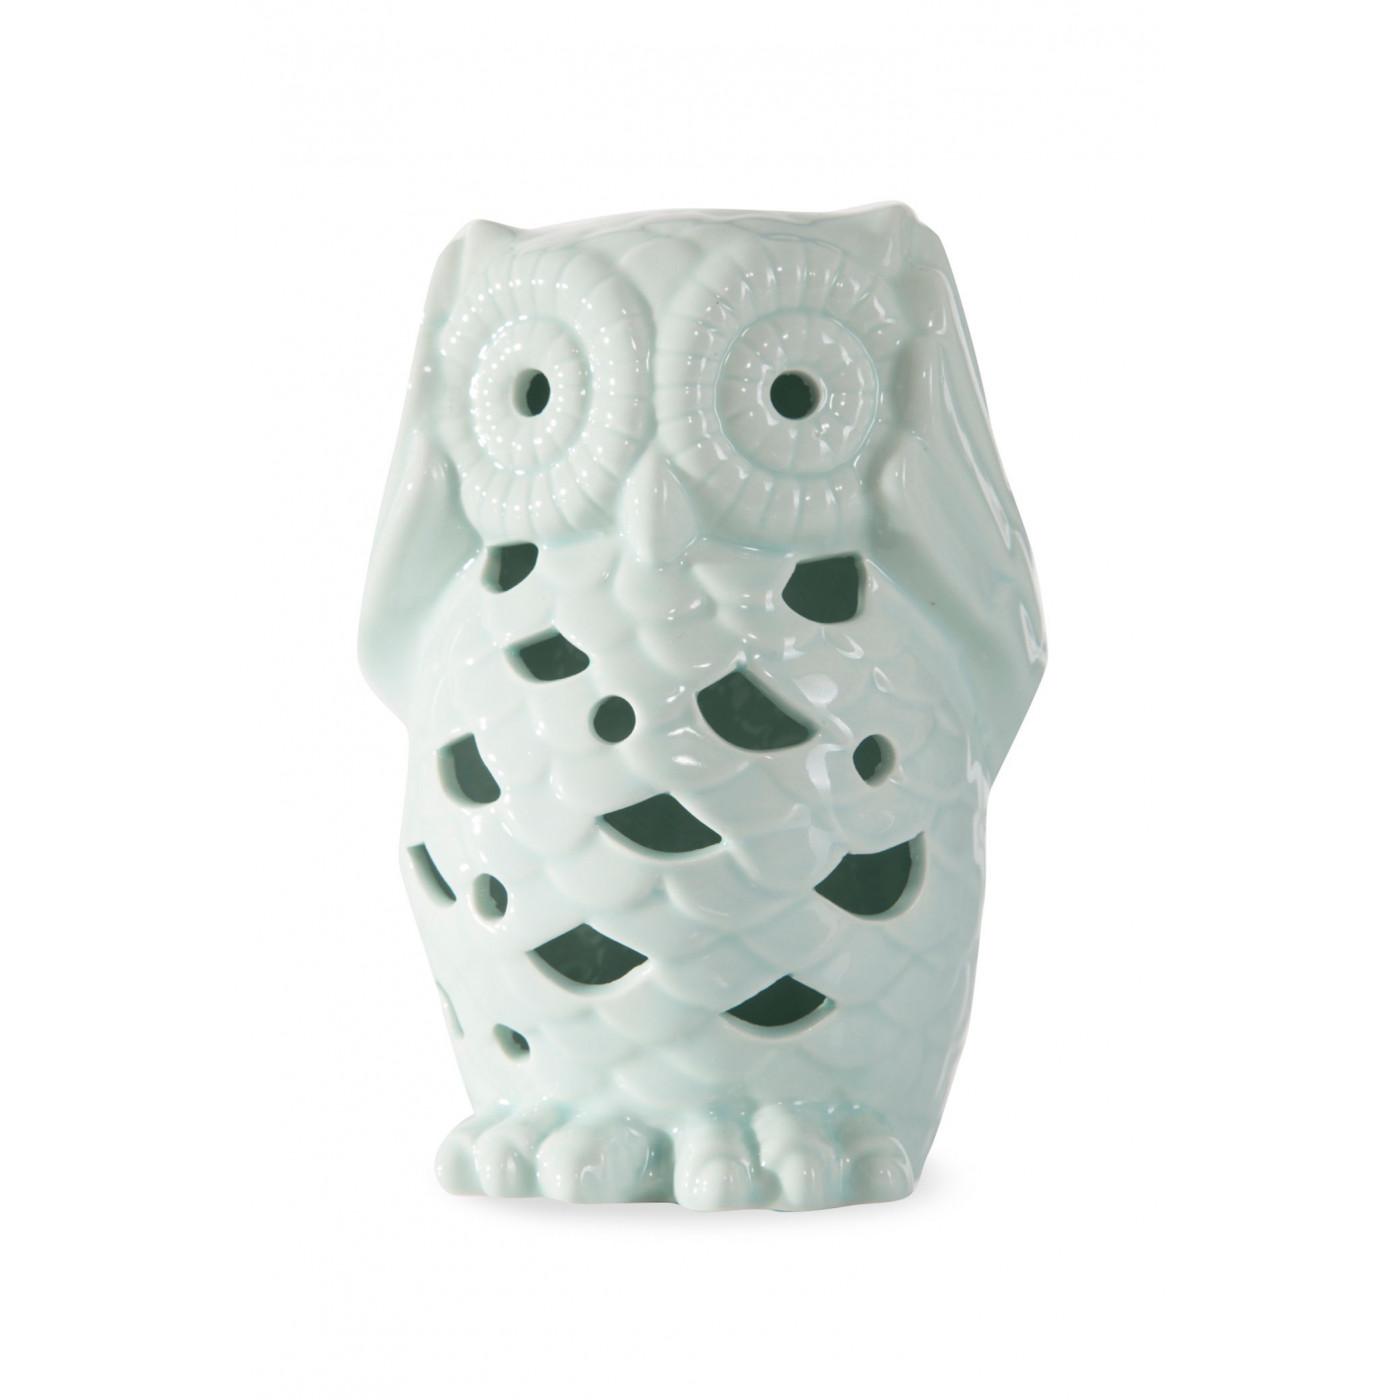 Figurka ceramiczna miętowa sowa ażur 14 cm